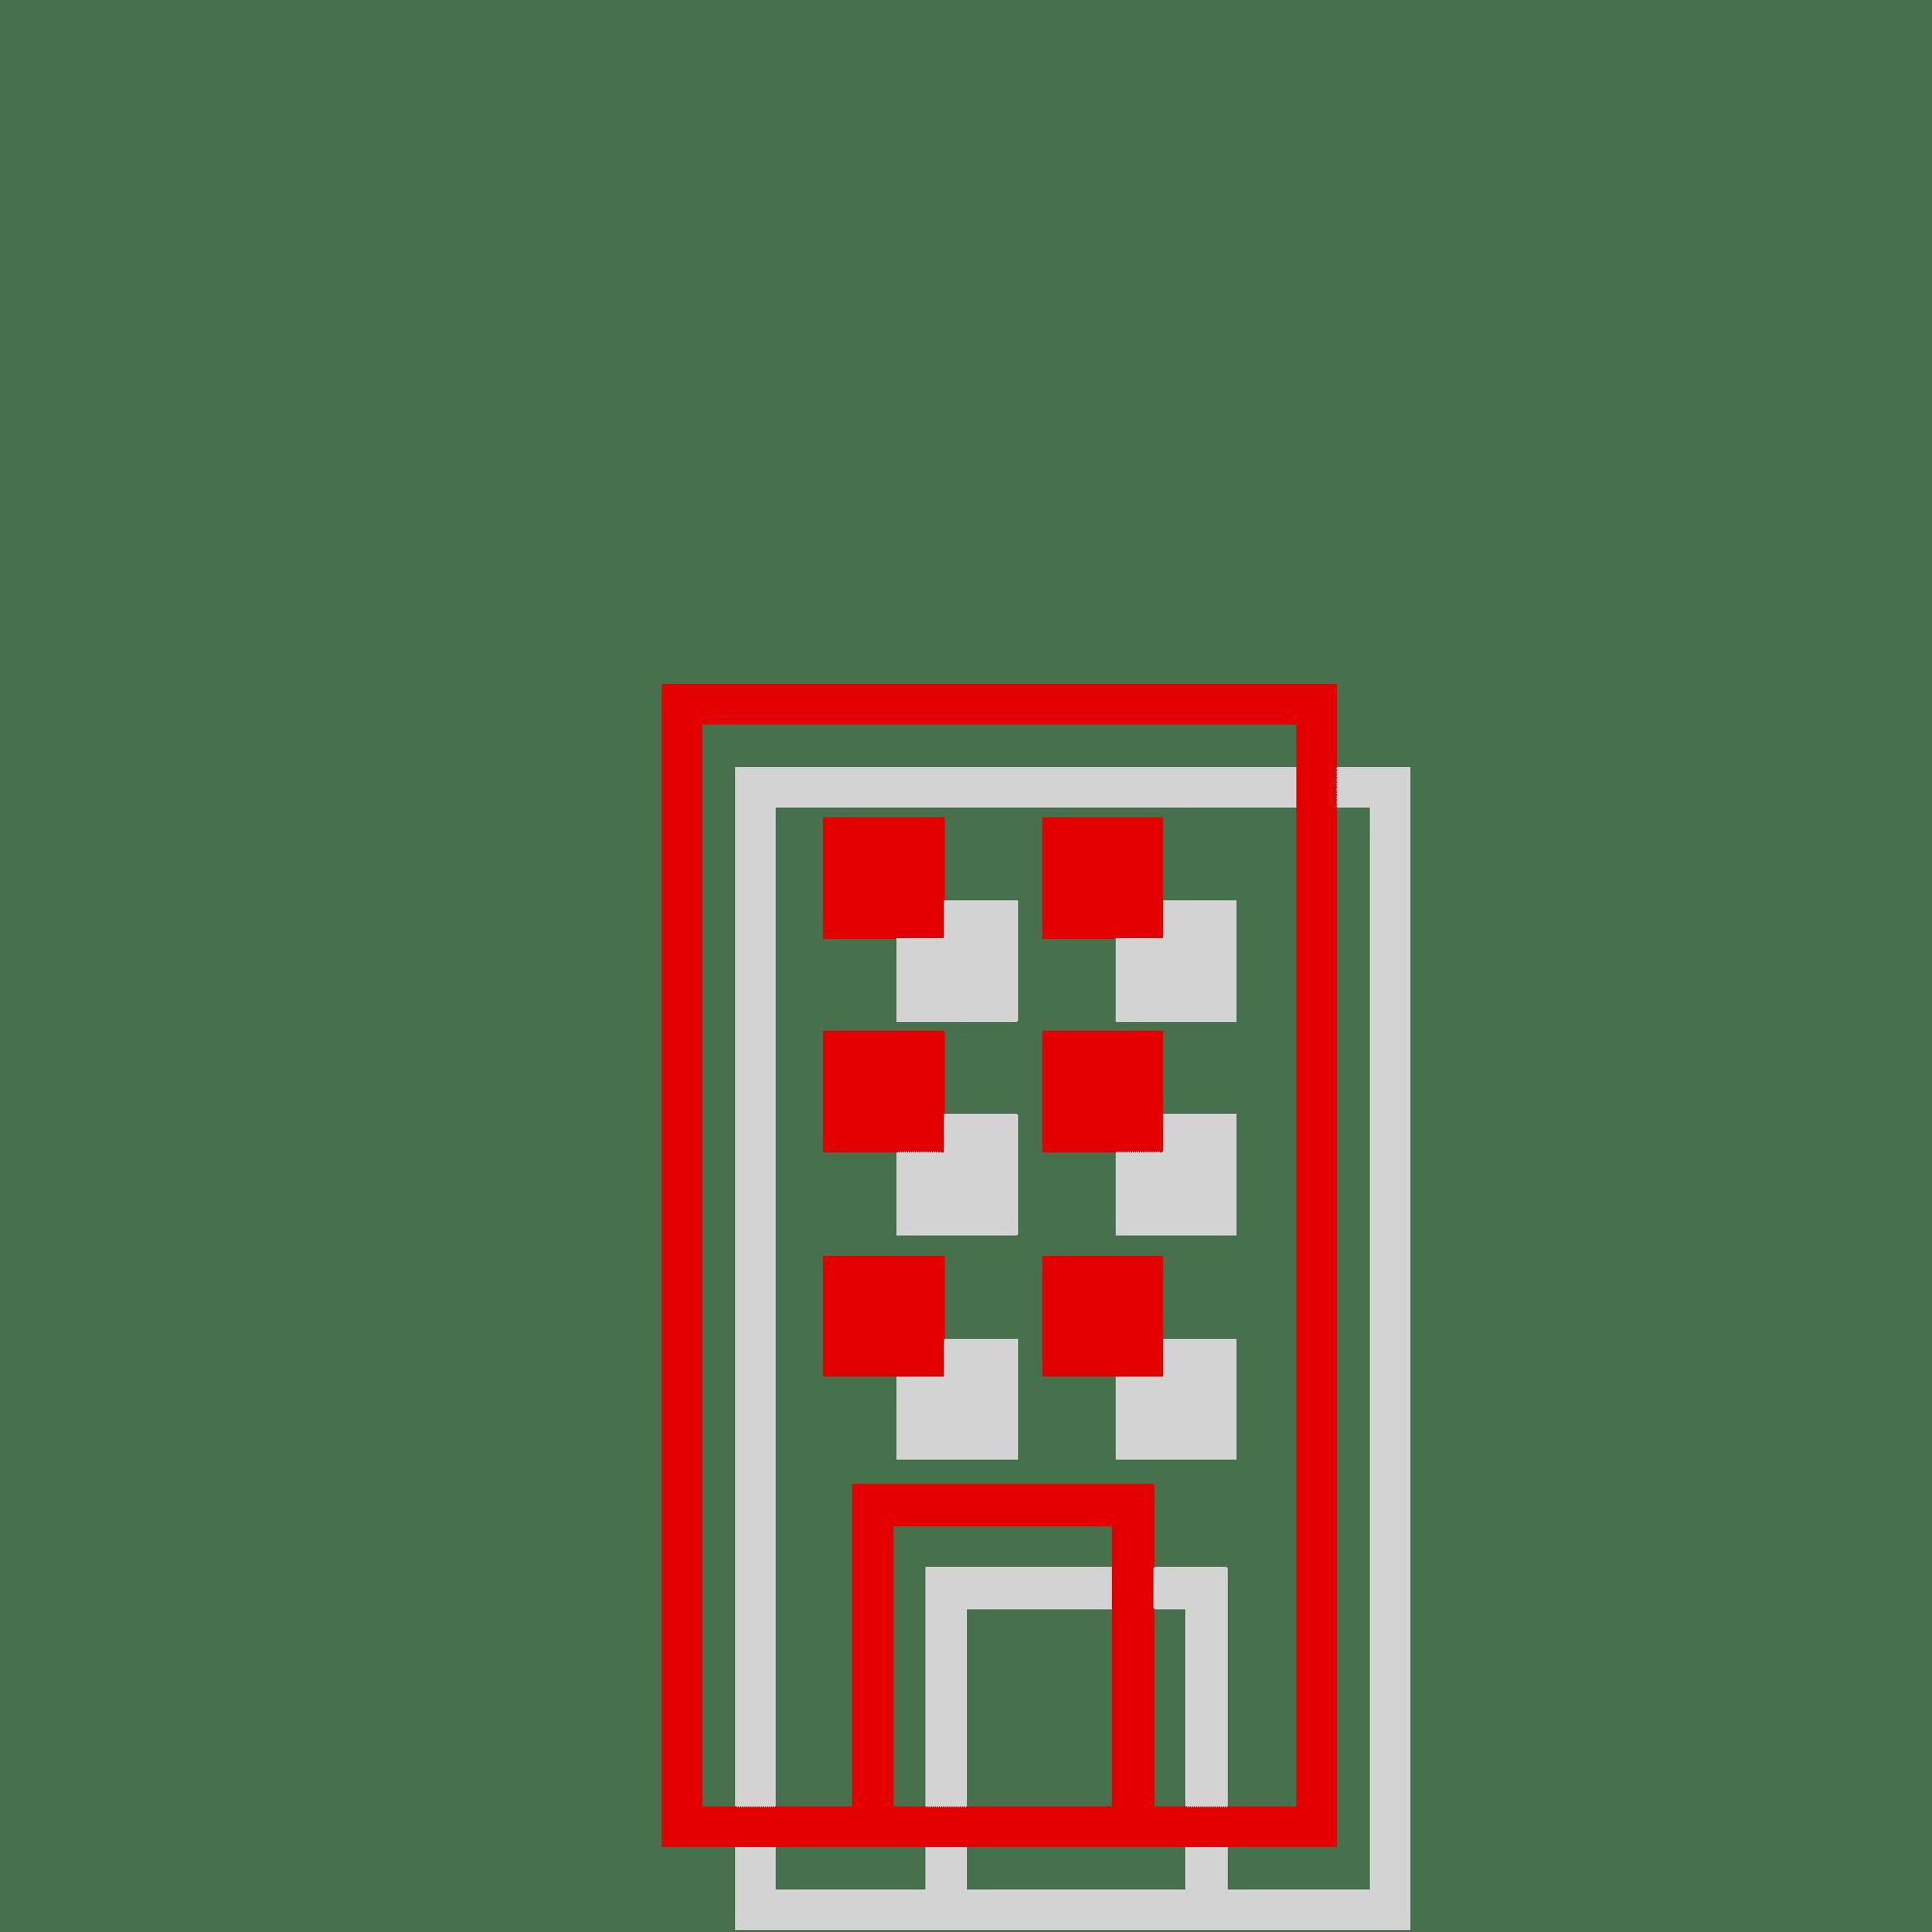 small company icon shadow